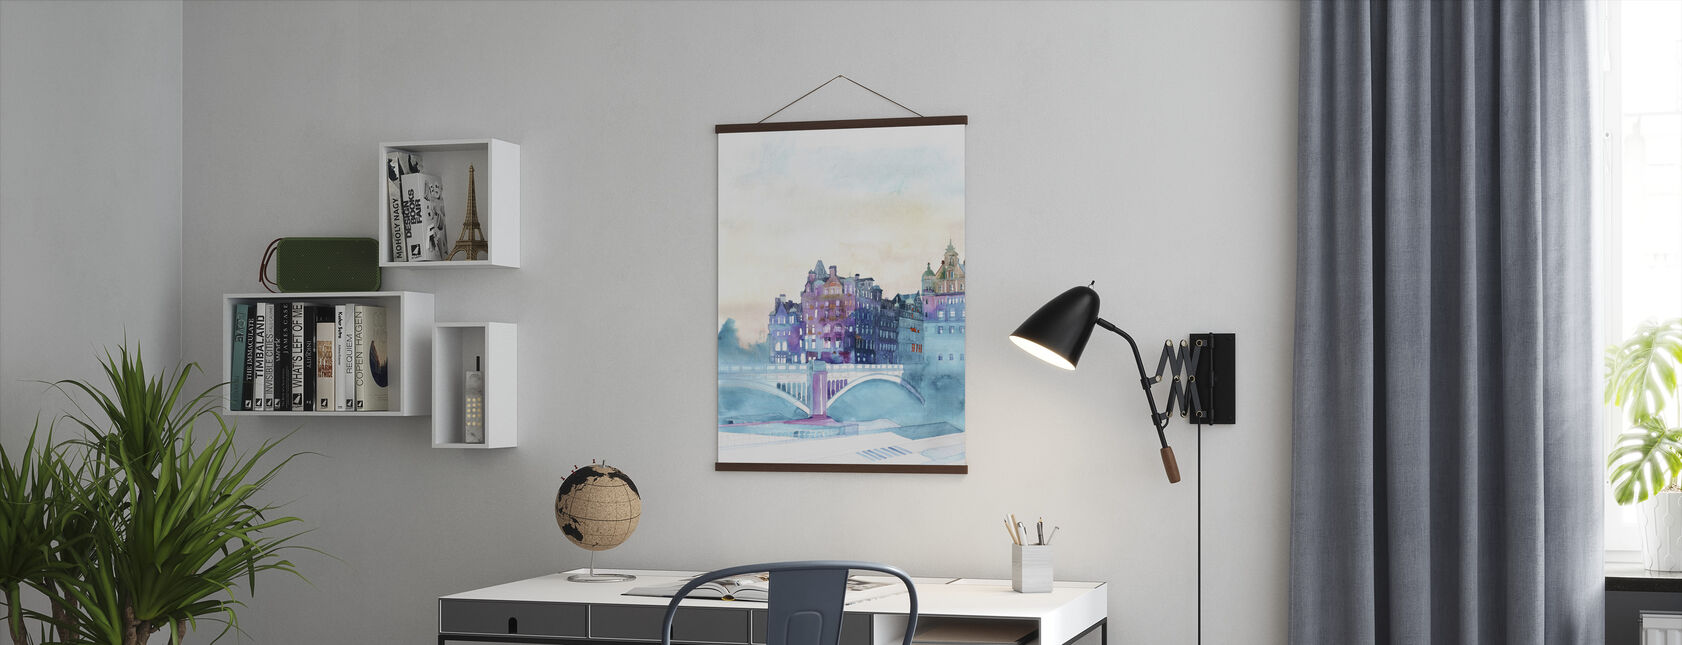 Vinter i Edinburgh - Poster - Kontor